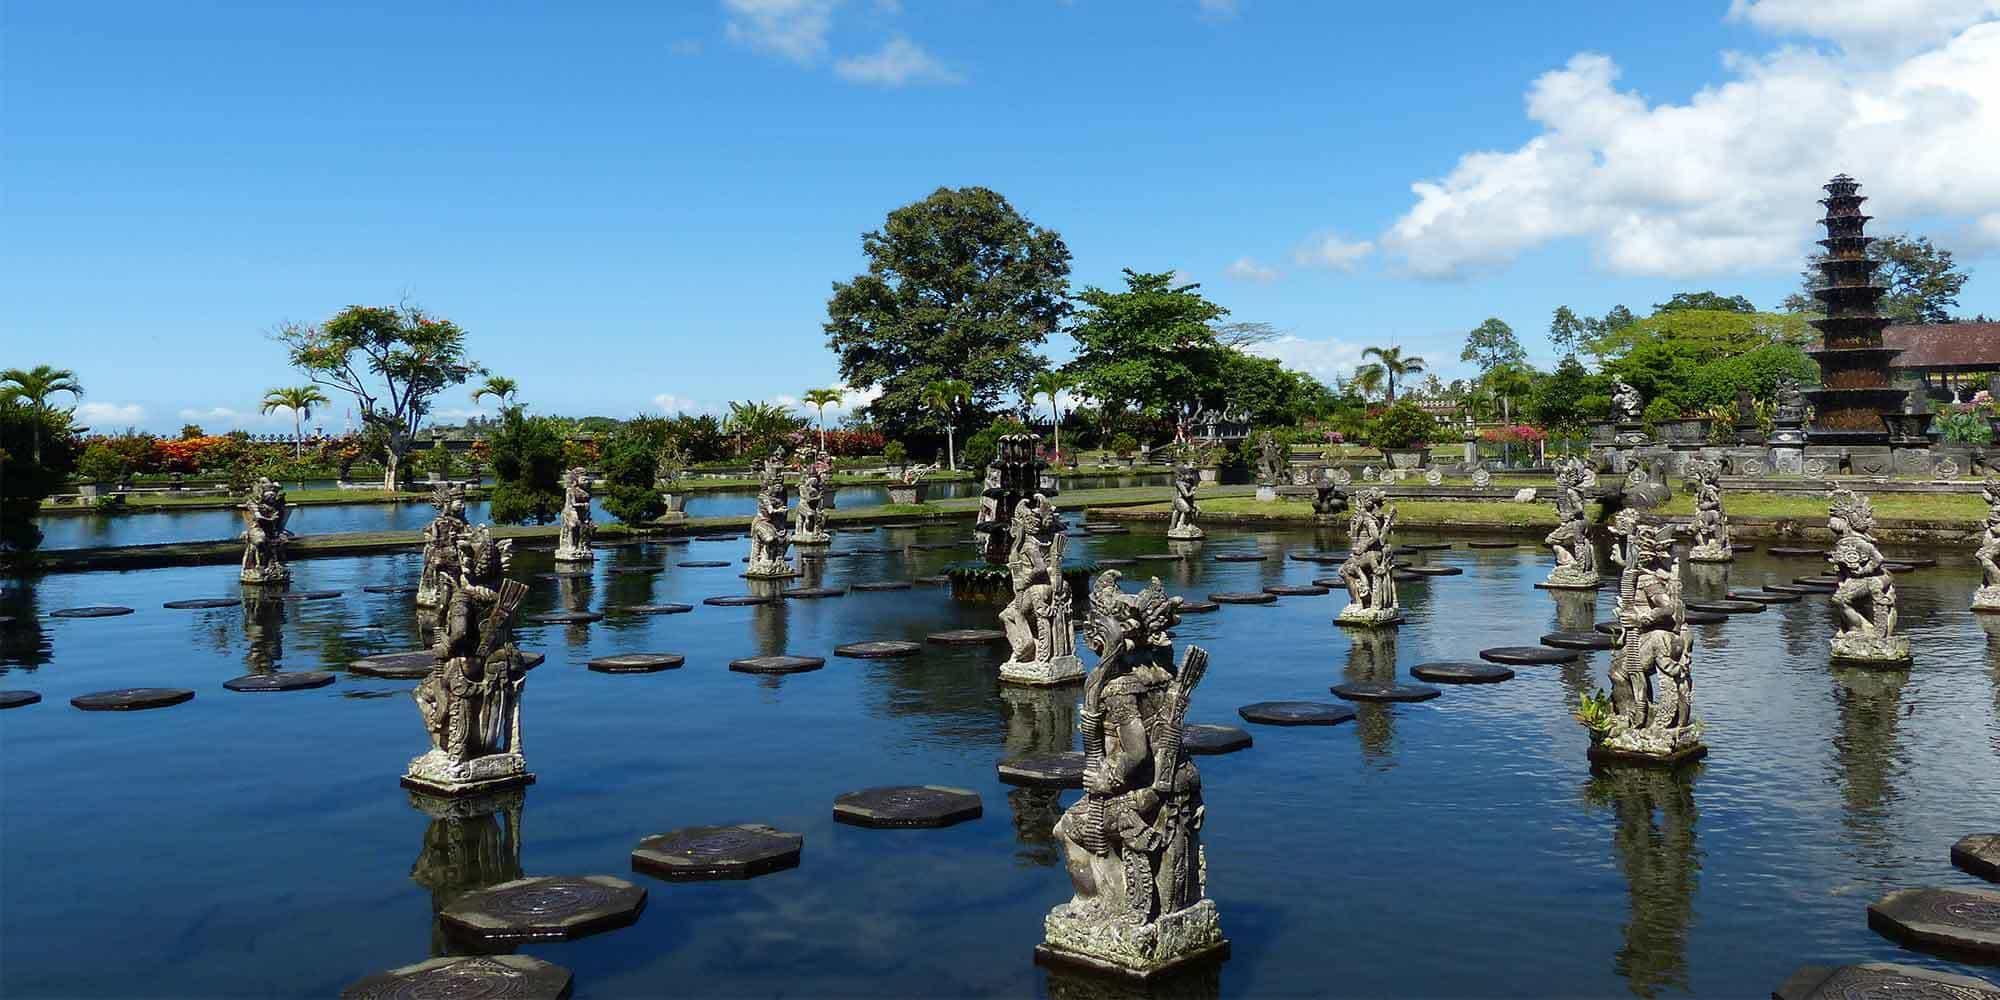 sidemen bali palais de l'eau indonésie